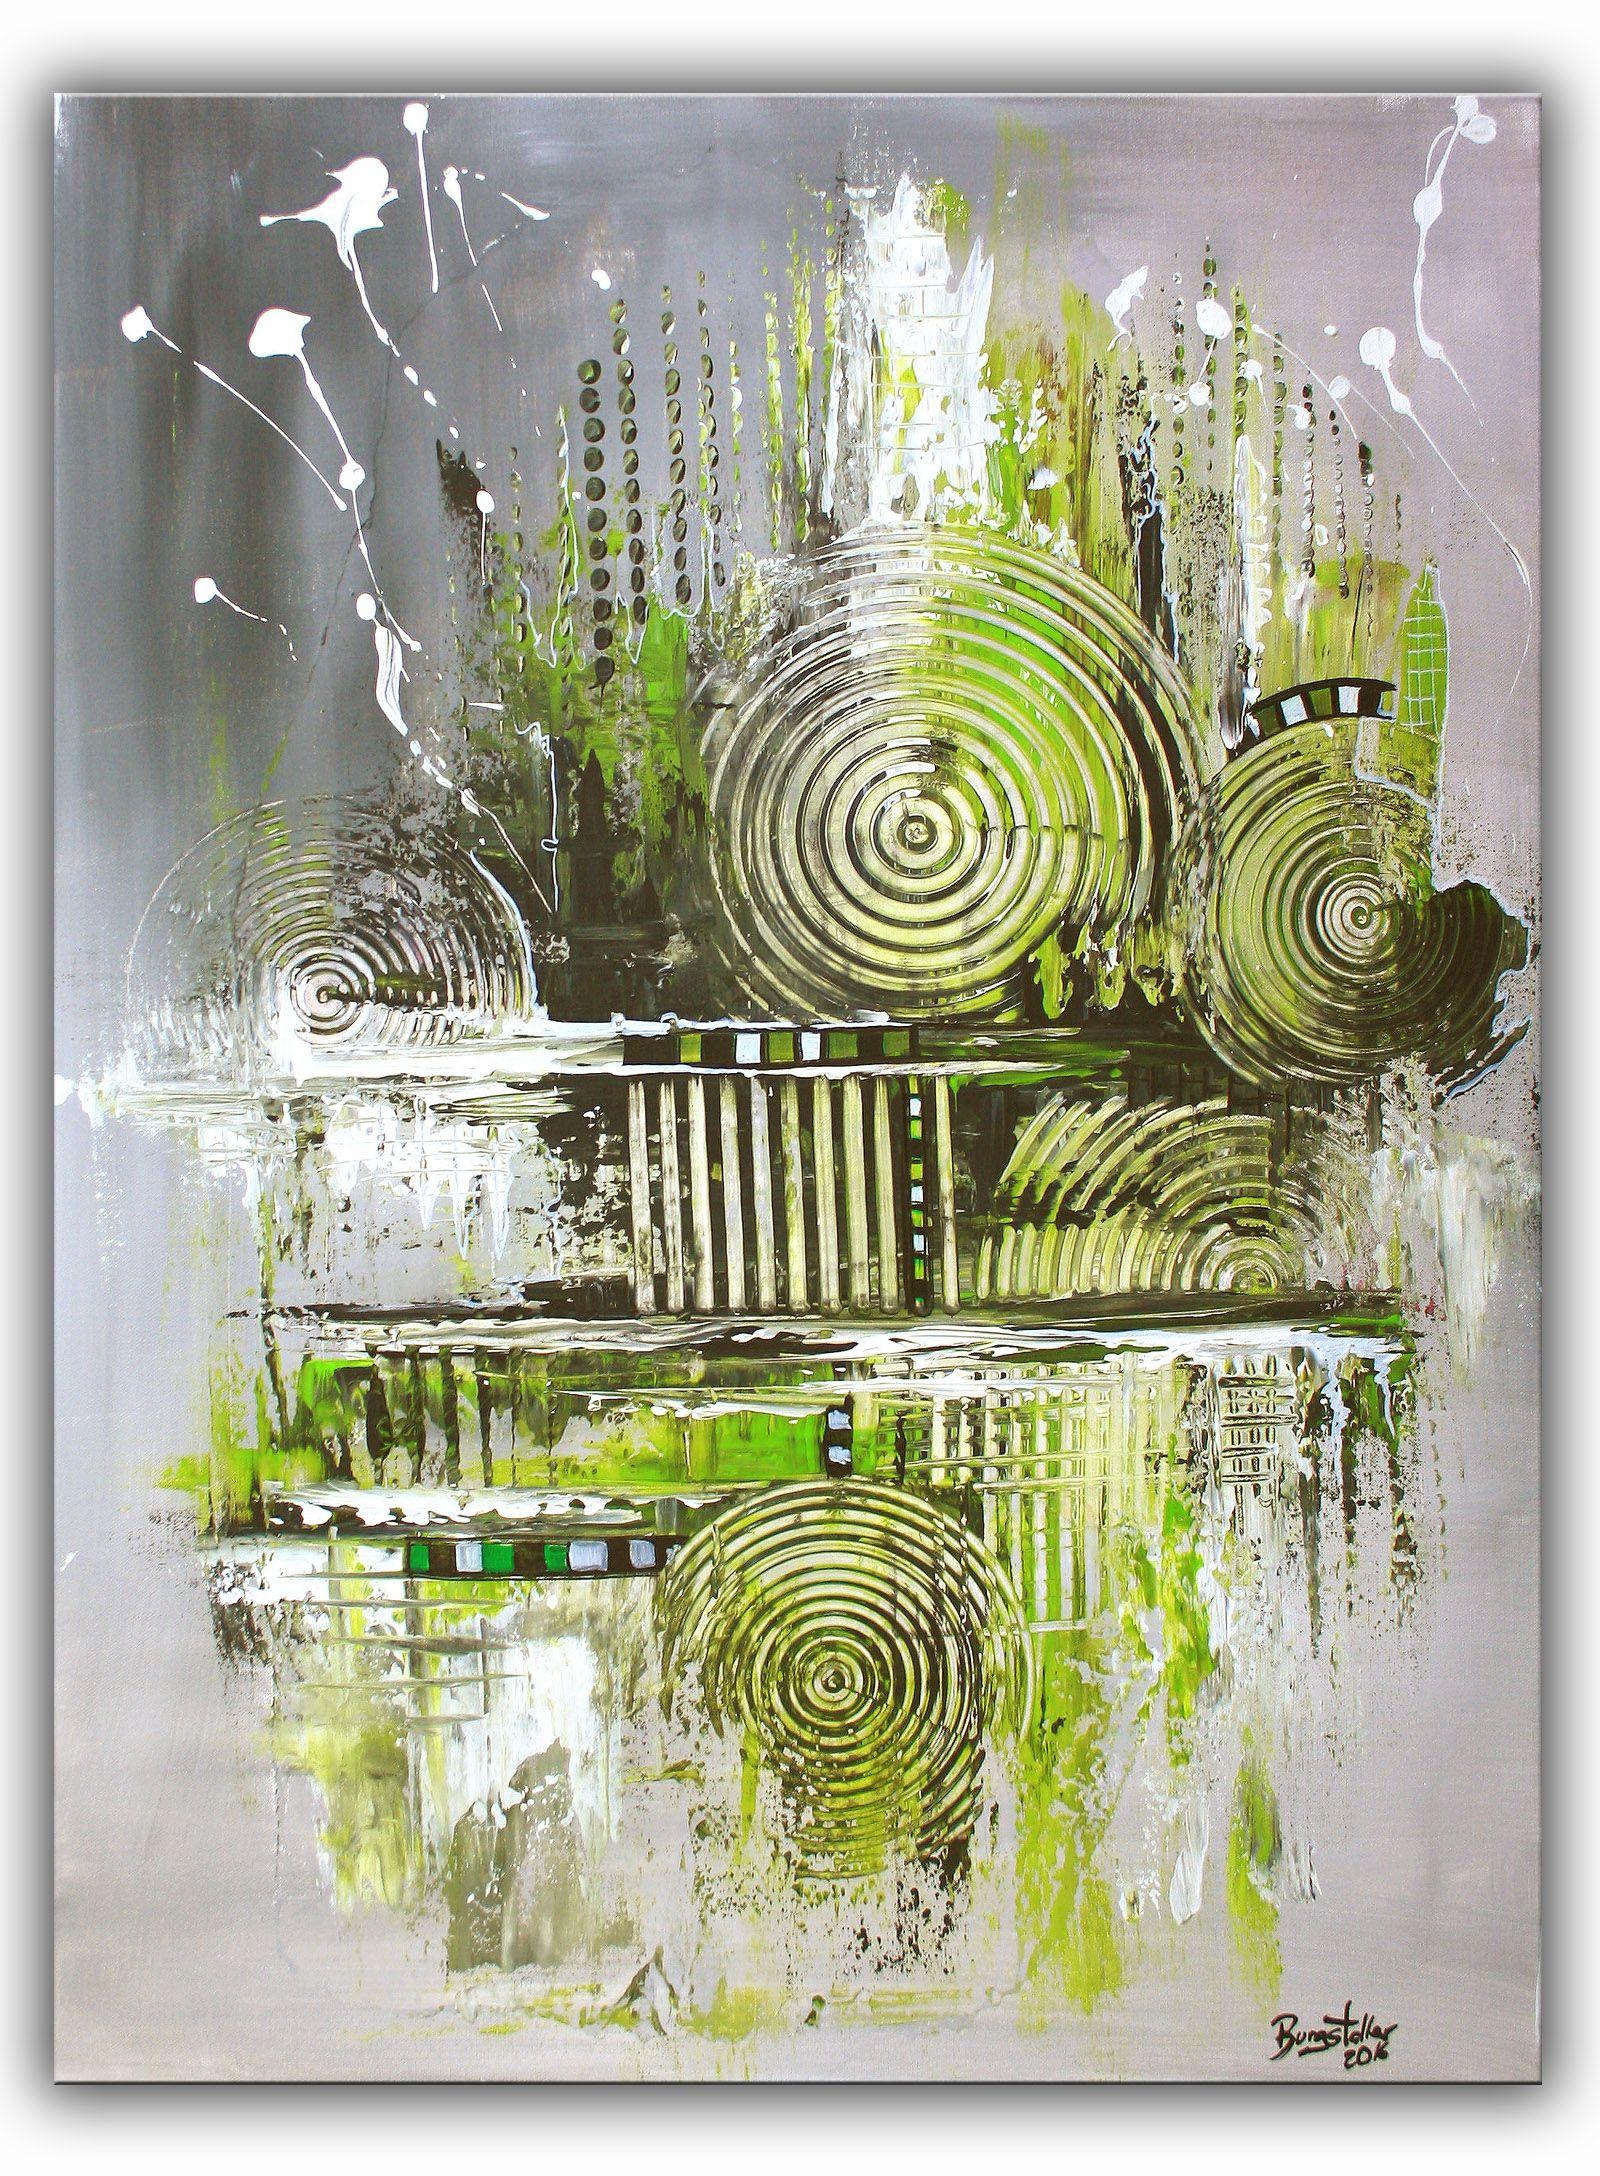 navigation gr n grau acrylbild abstrakt gr ne malerei gem lde abstrakte original bild. Black Bedroom Furniture Sets. Home Design Ideas